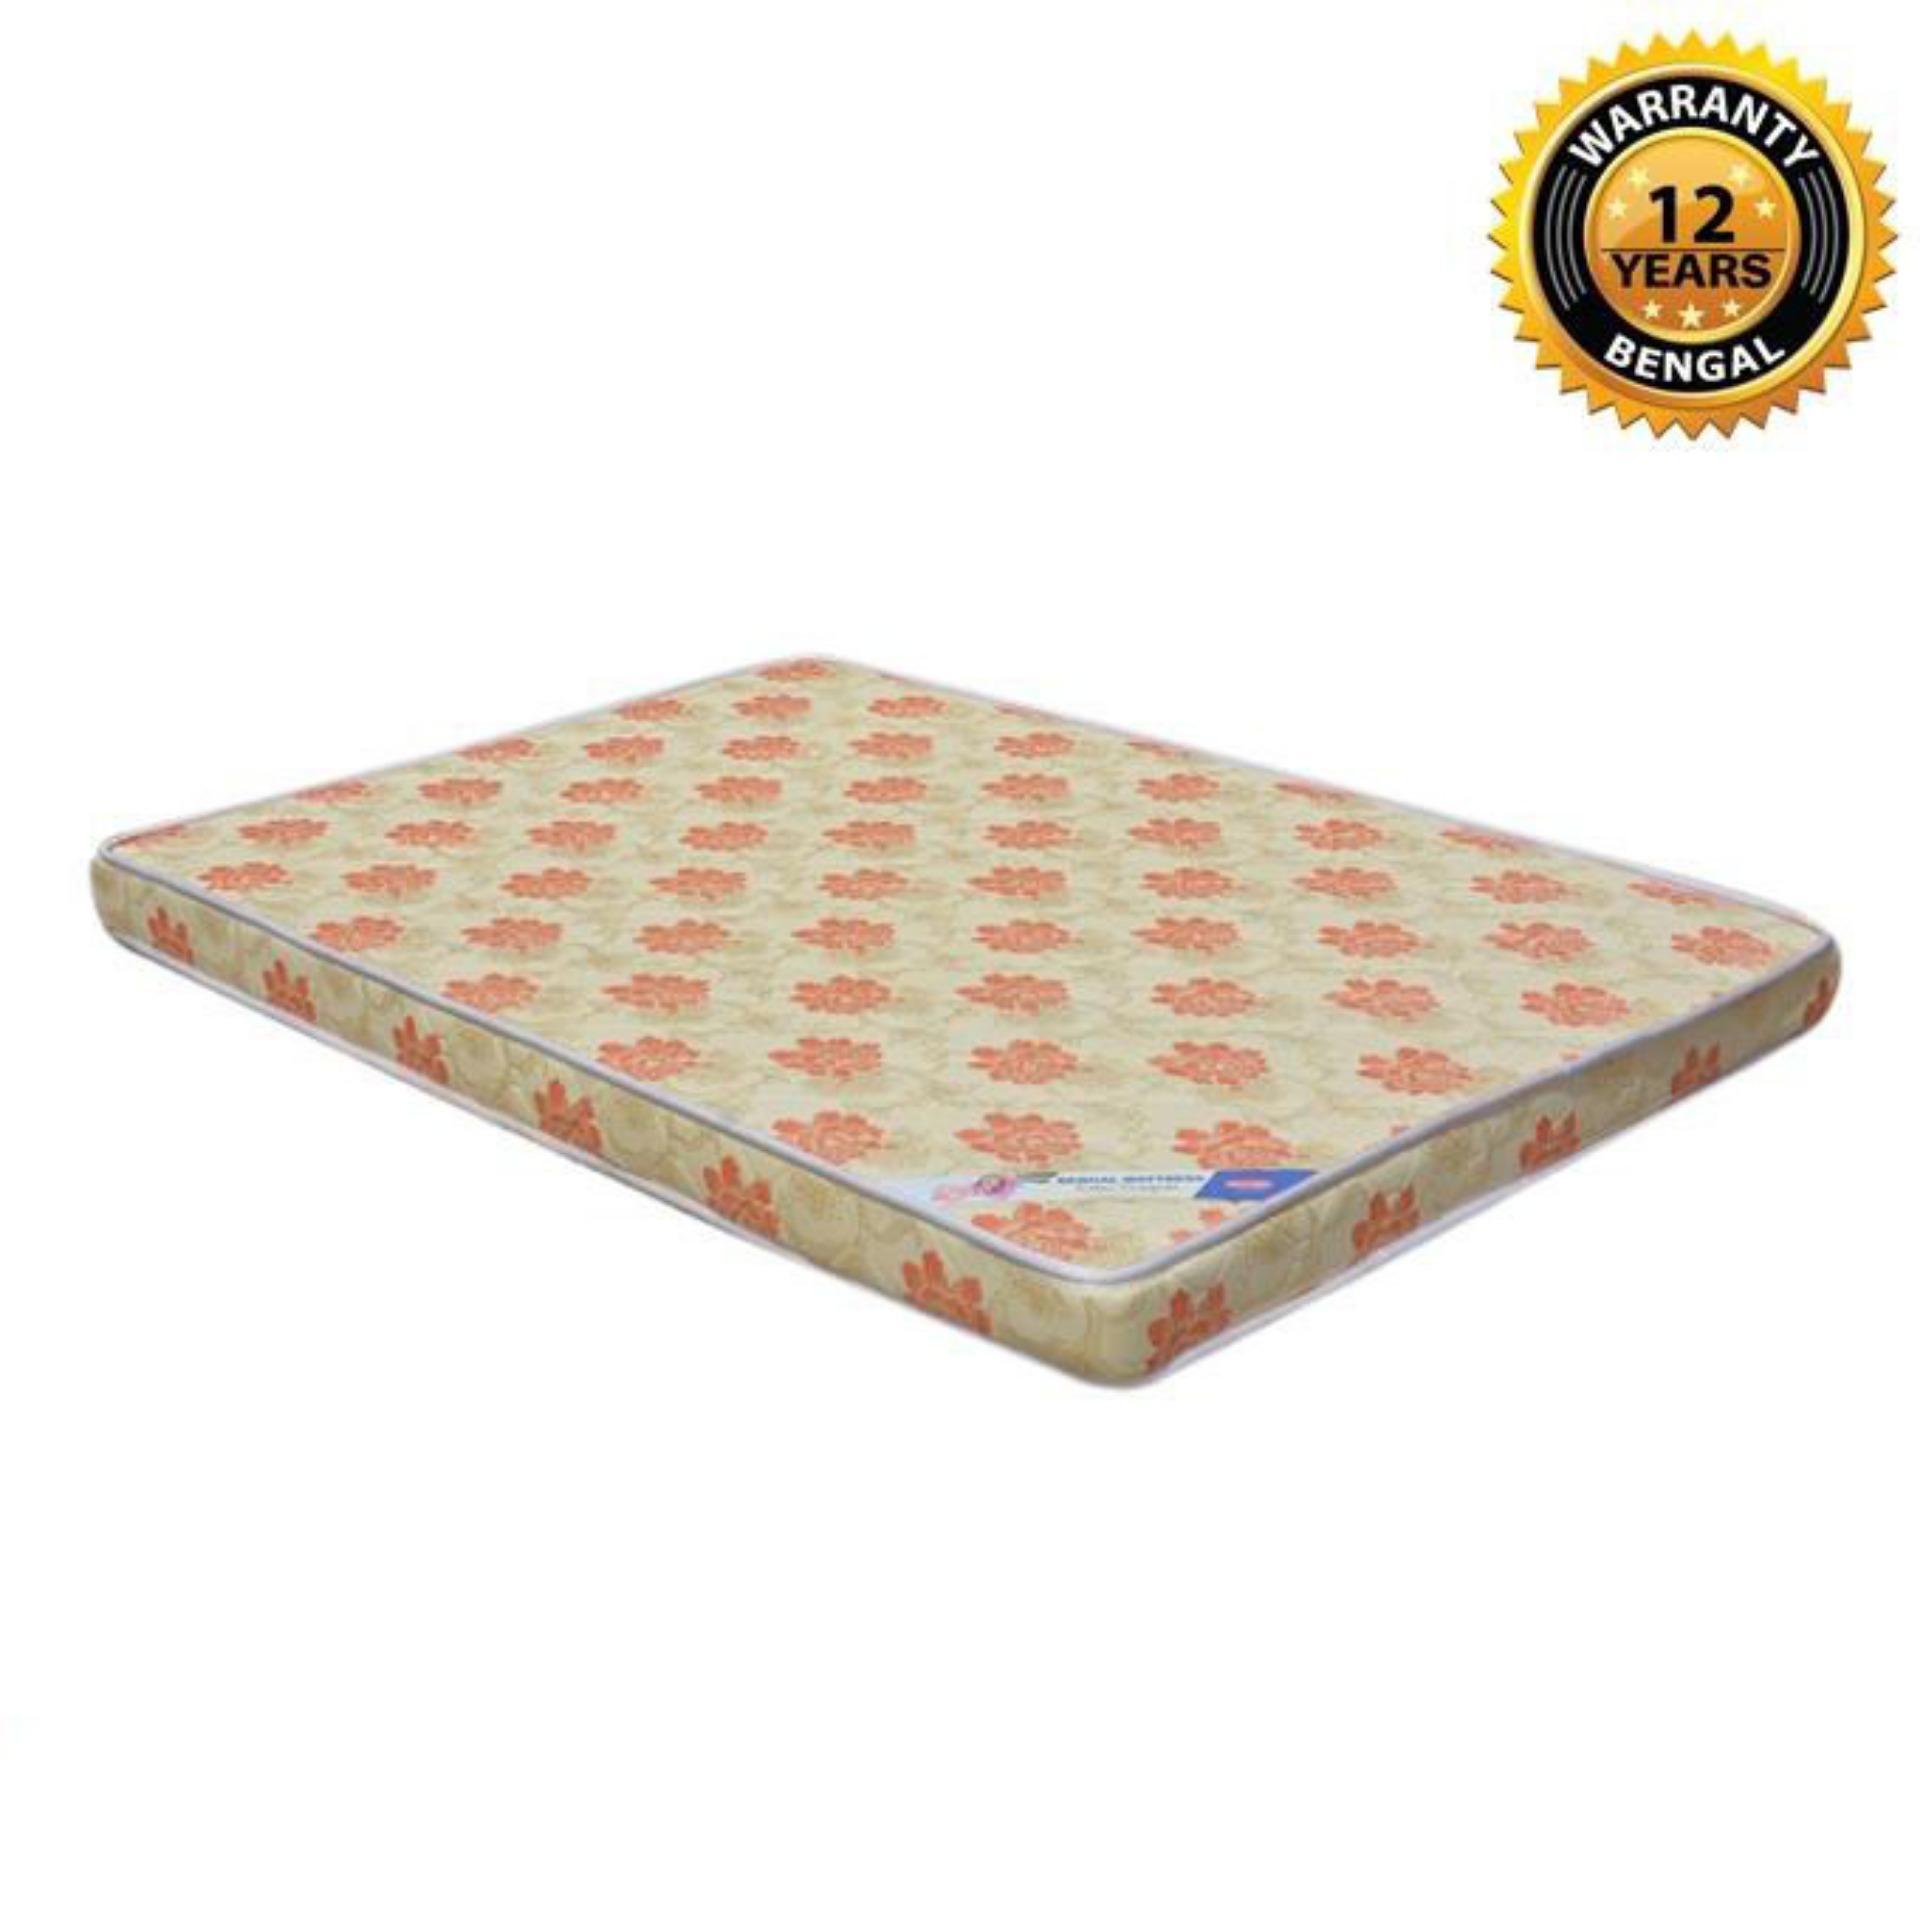 "Bengal Spring Mattress (78""x60""x12"") - Multicolor"